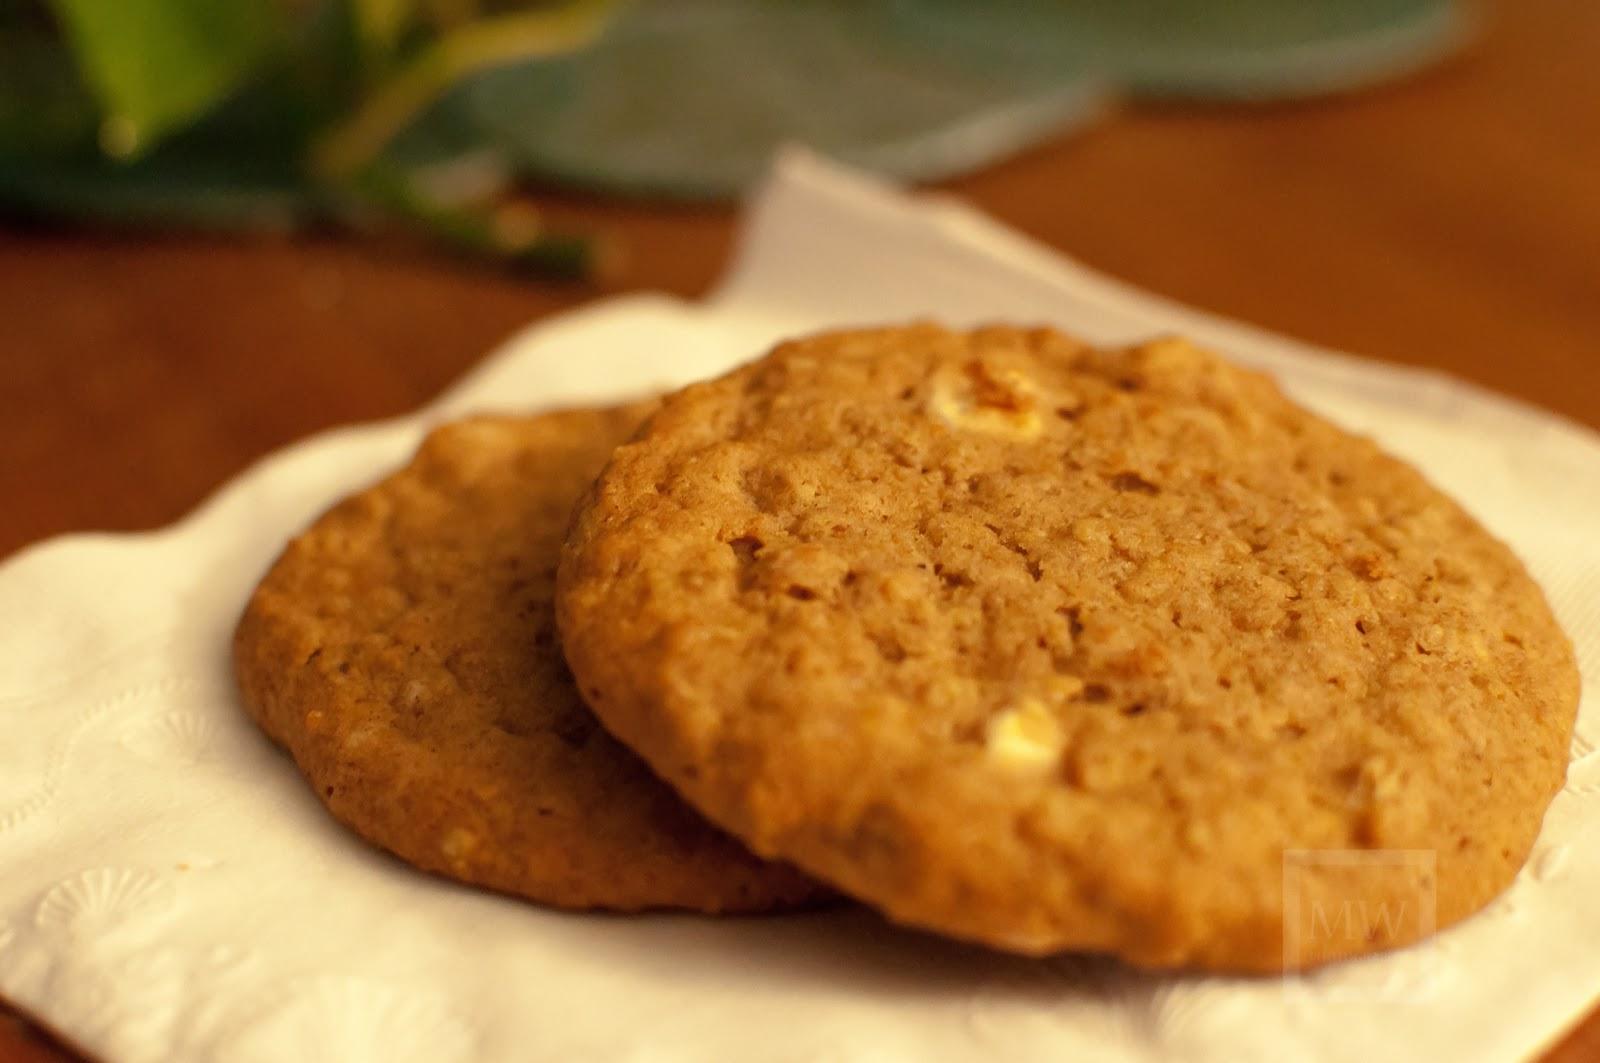 Oatmeal Raisin Cookies Accident Chocolate Cookies